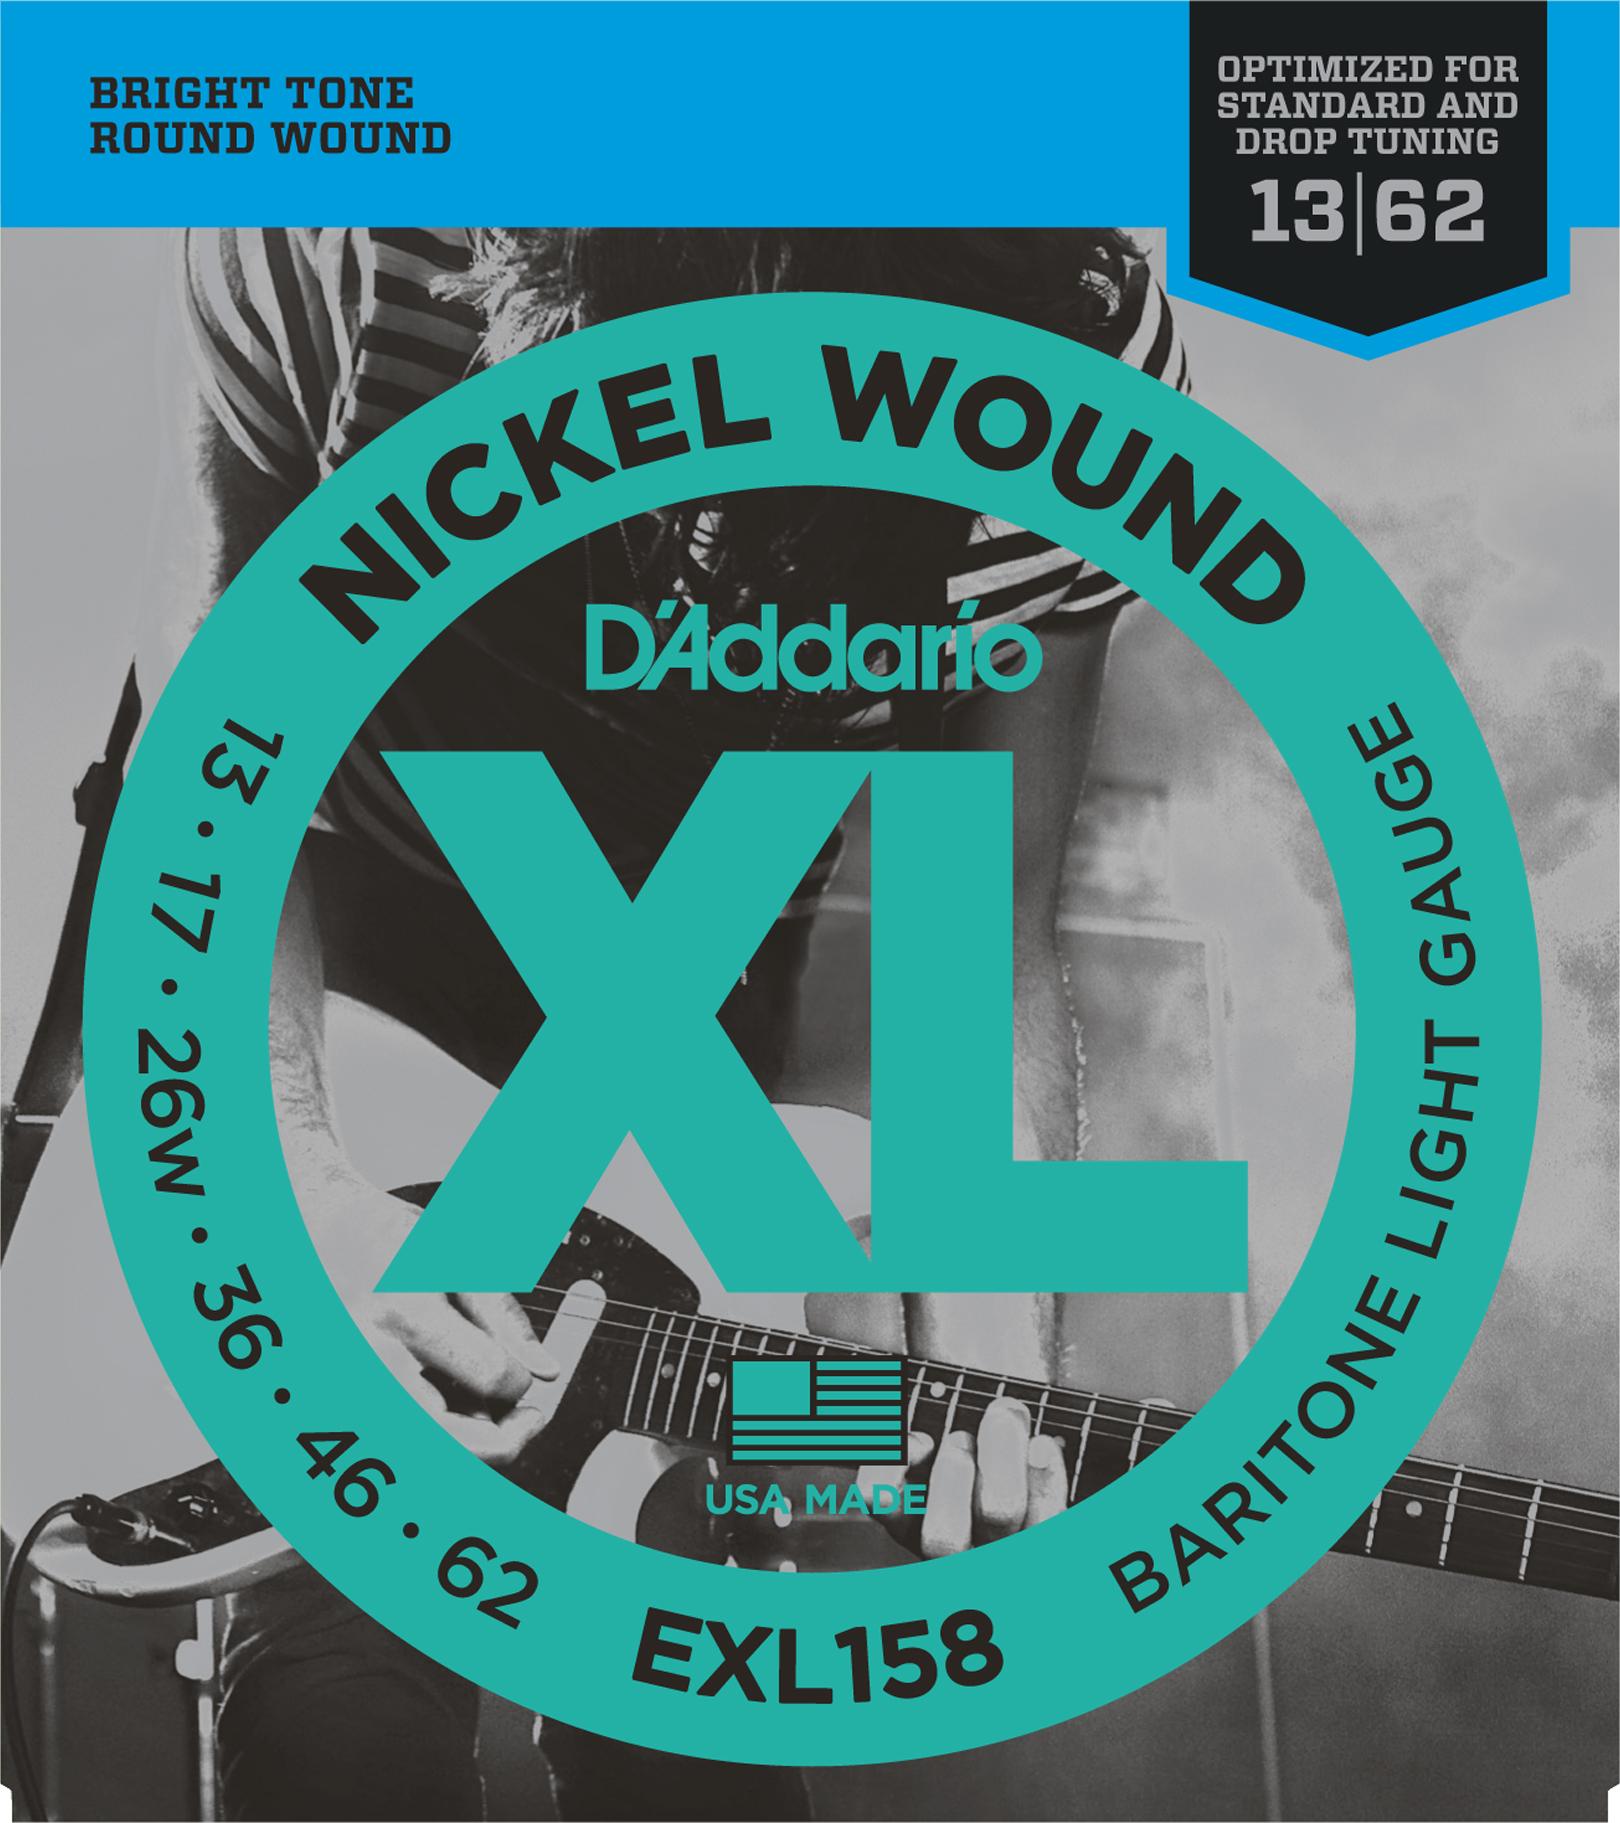 D'Addario EXL158 Nickel Wound Electric Guitar Strings Baritone Light, 13-62